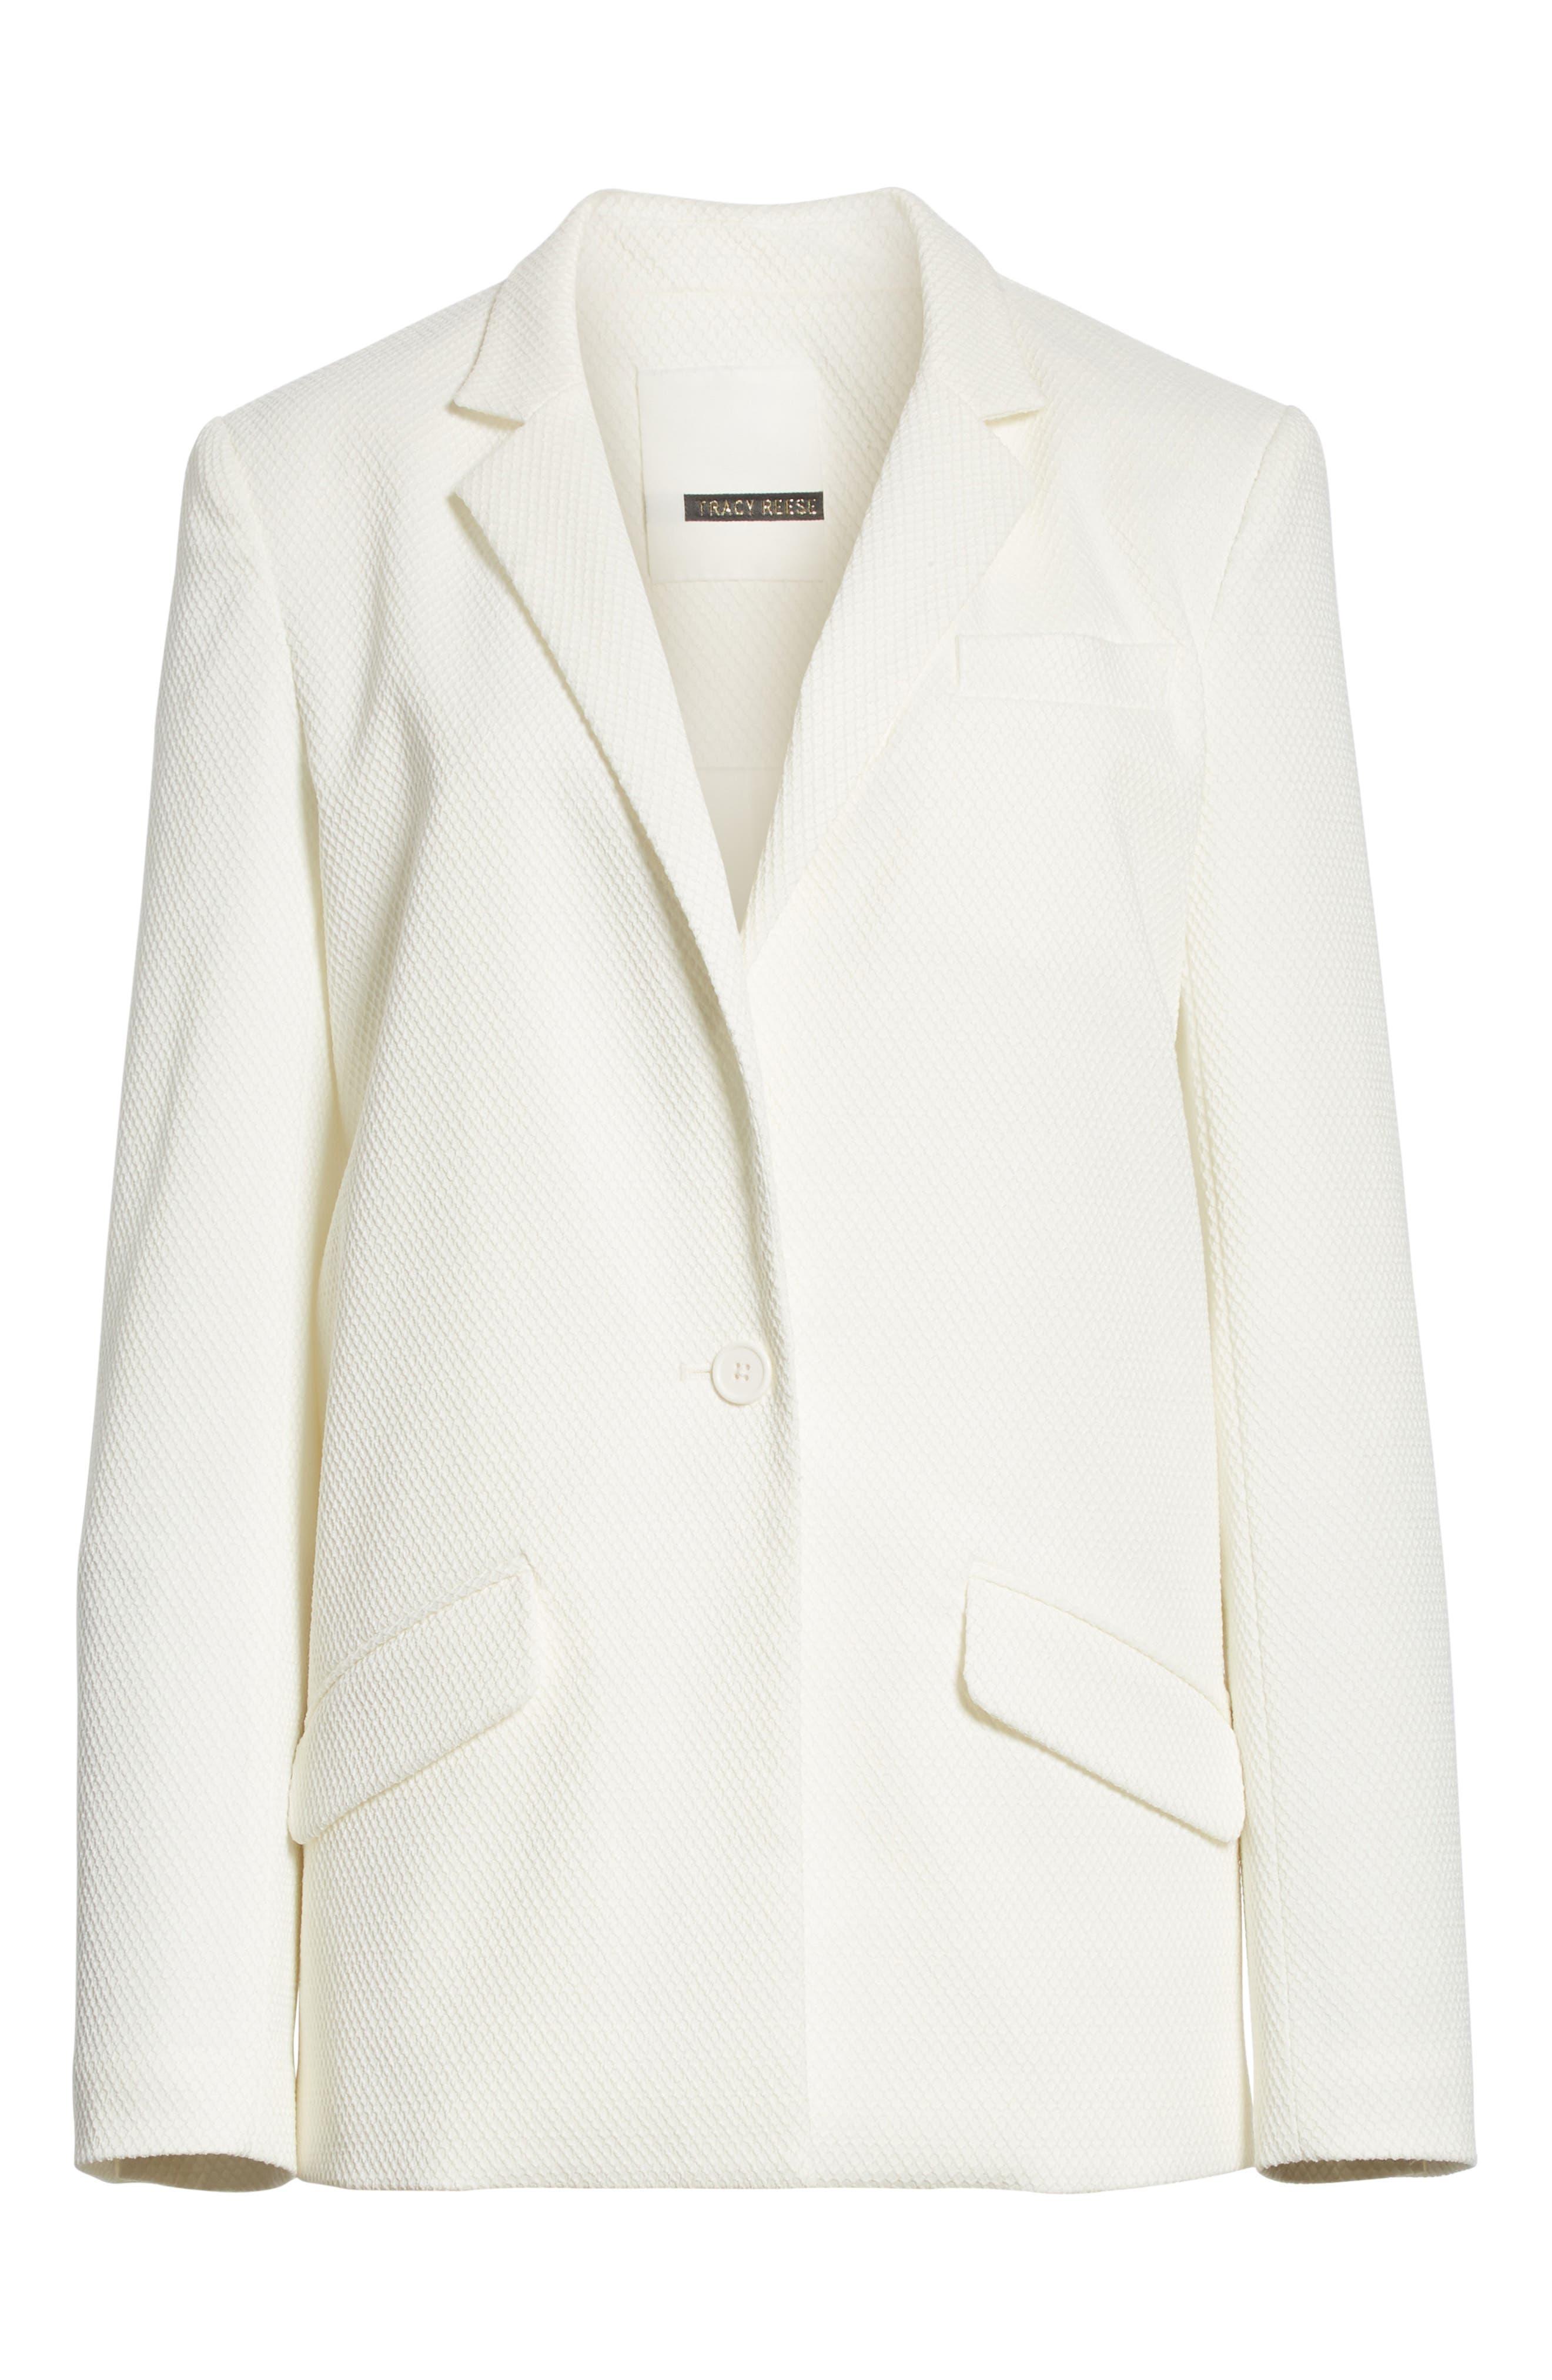 Textured Stretch Cotton Blend Blazer,                             Alternate thumbnail 6, color,                             Soft White